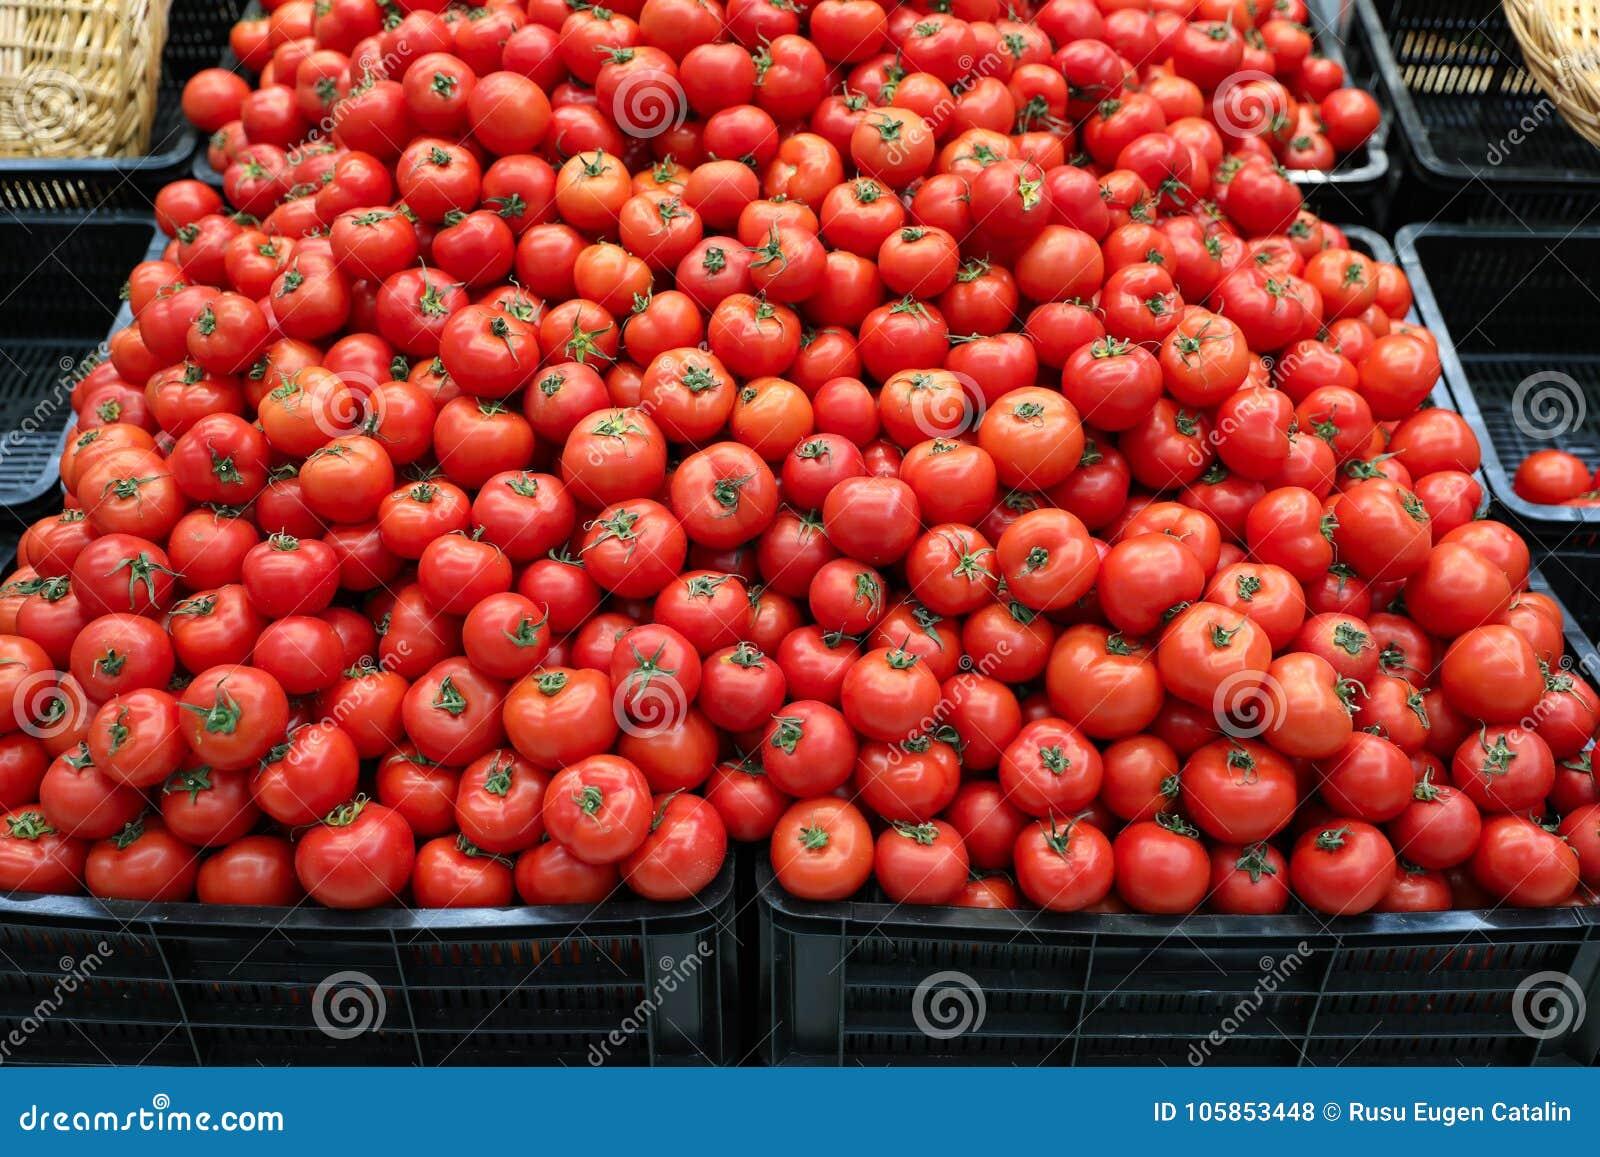 tomatoes bulk